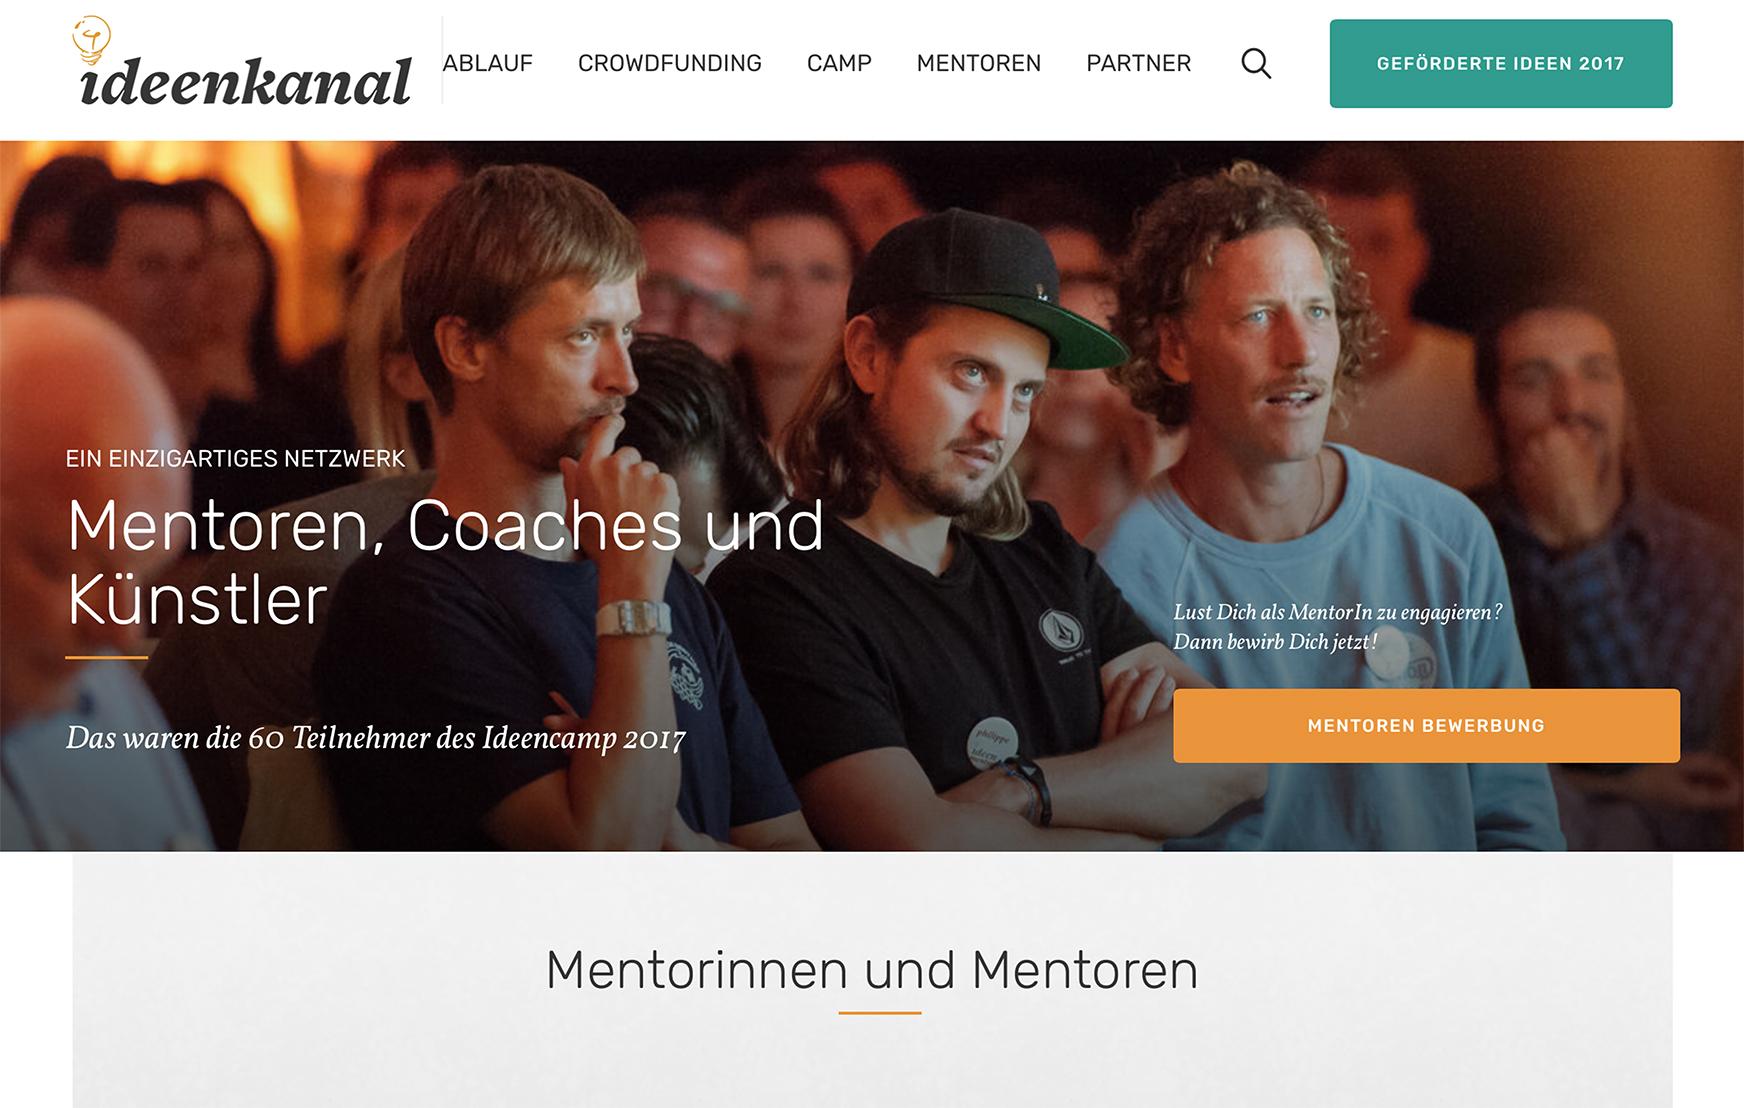 Ideenkanal Mentoren web.jpg